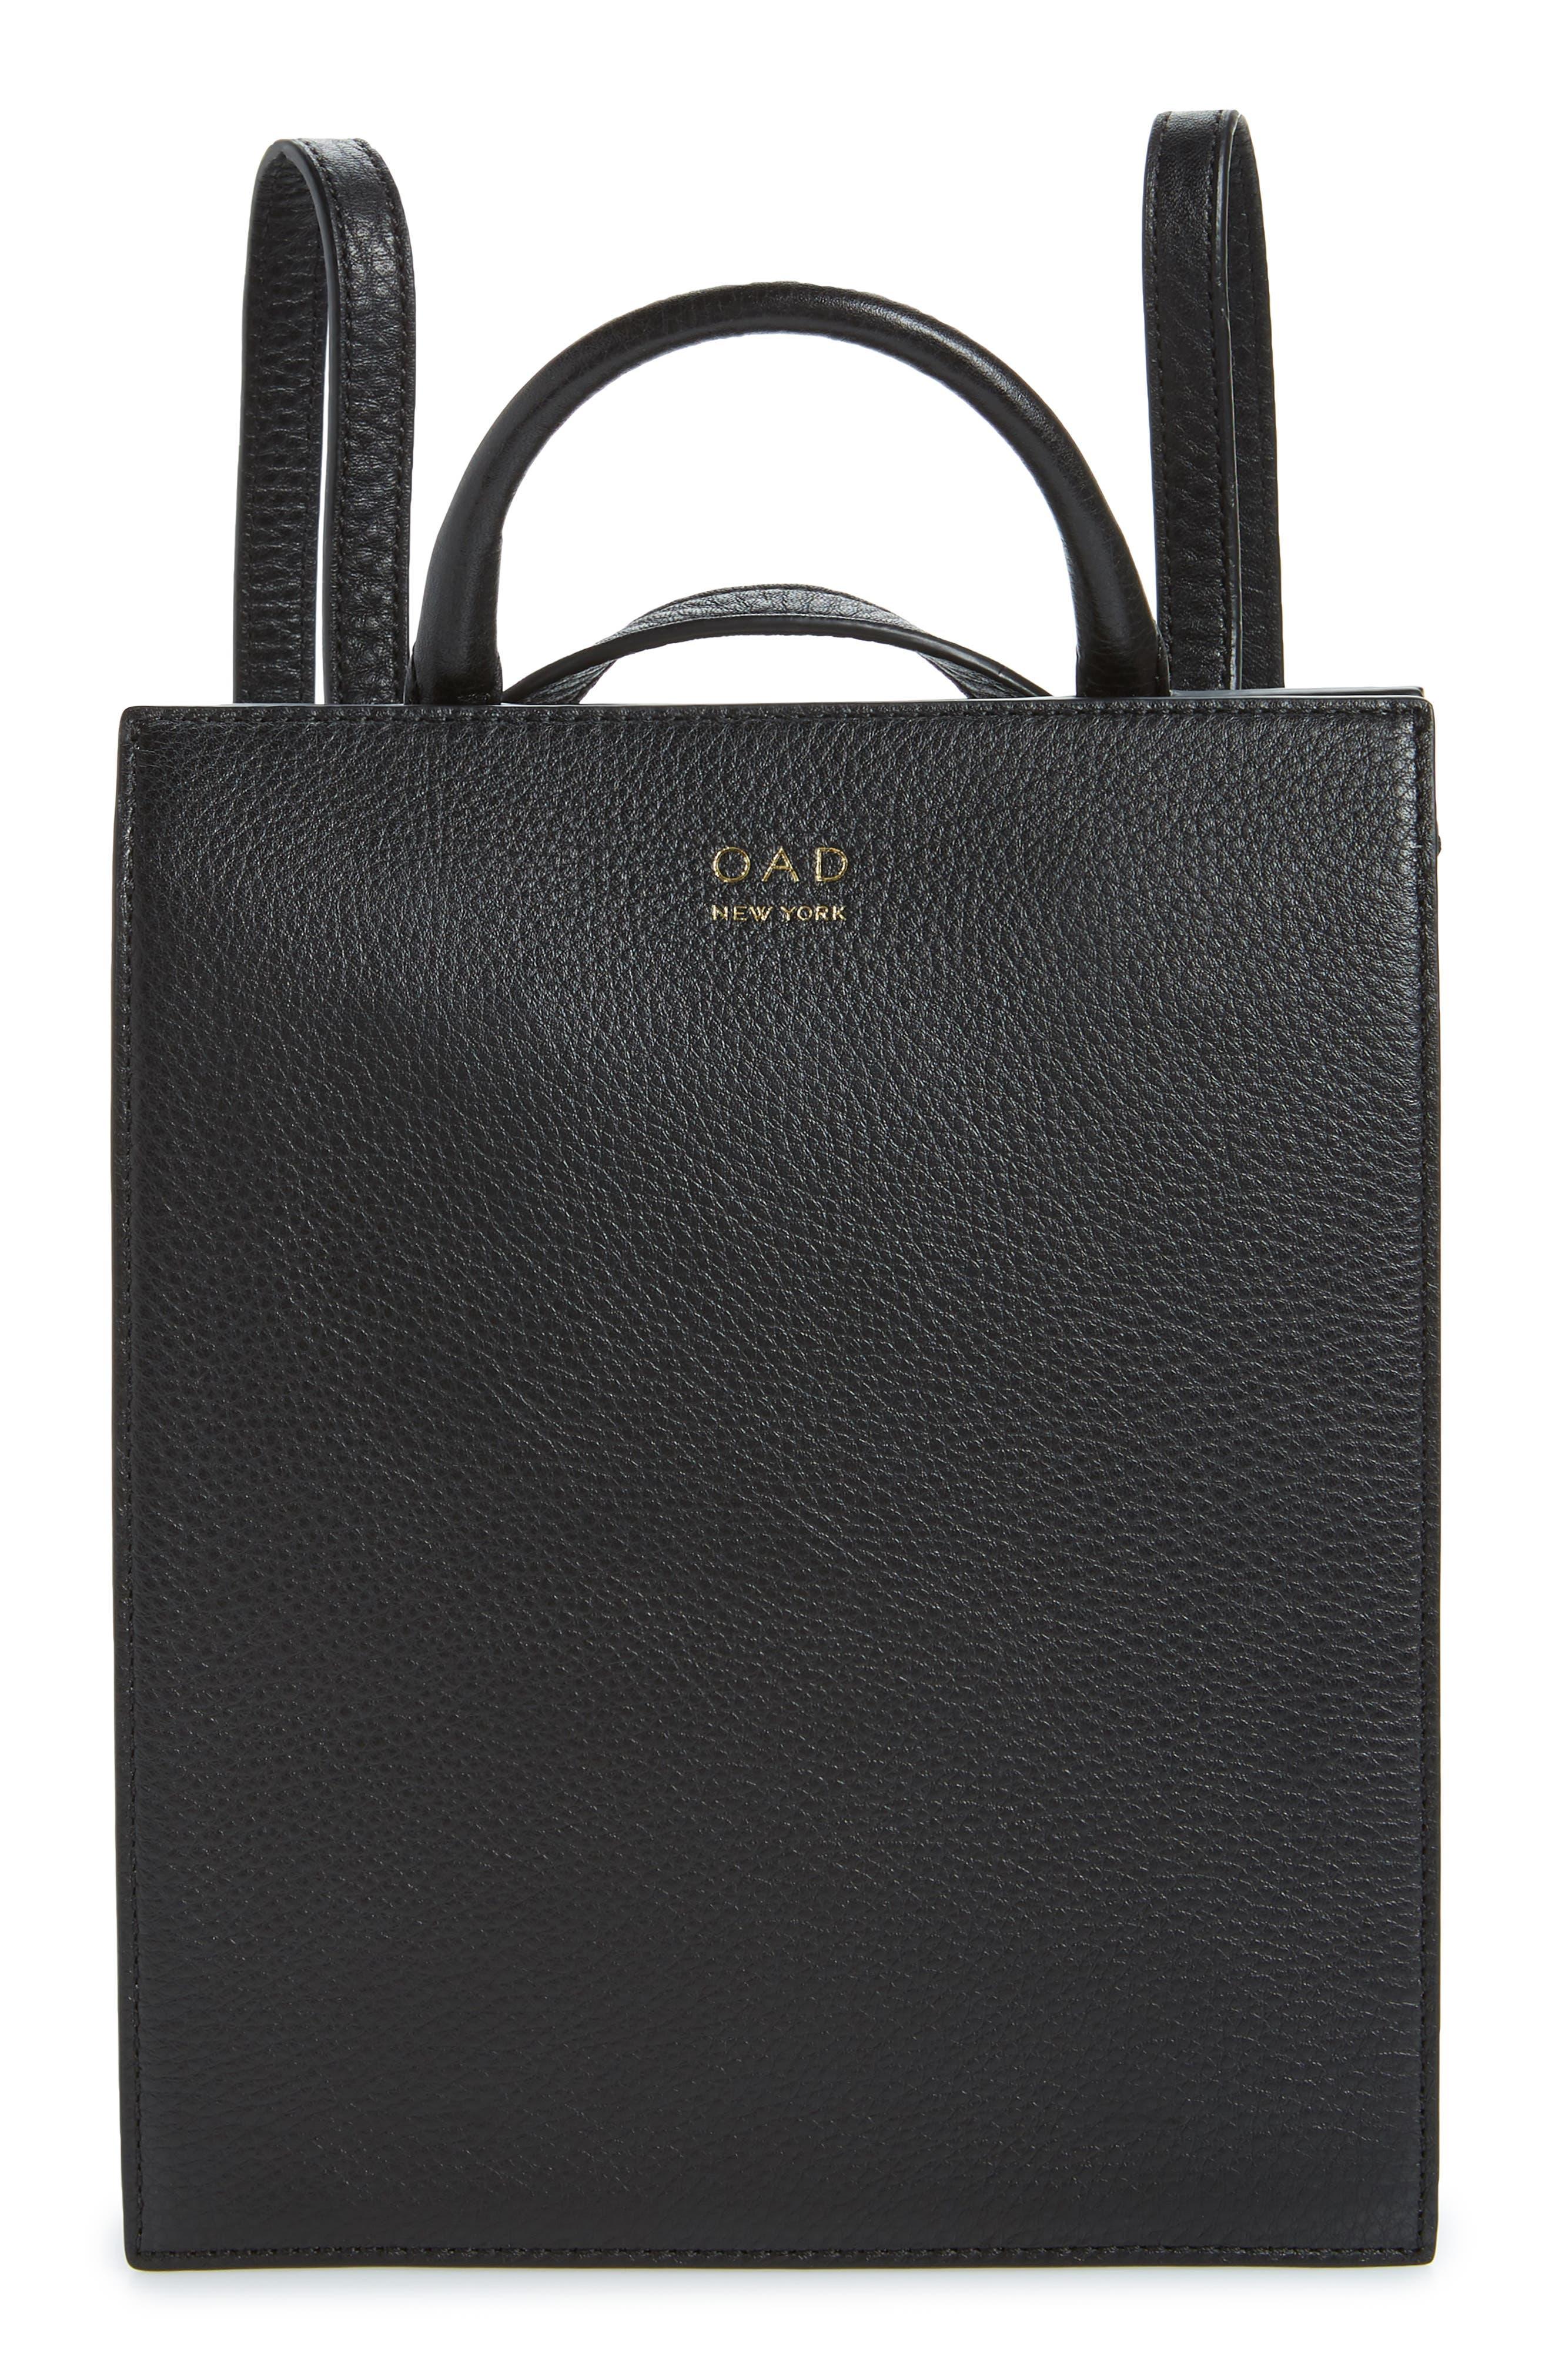 029097dc4e OAD New York Handbags   Wallets for Women